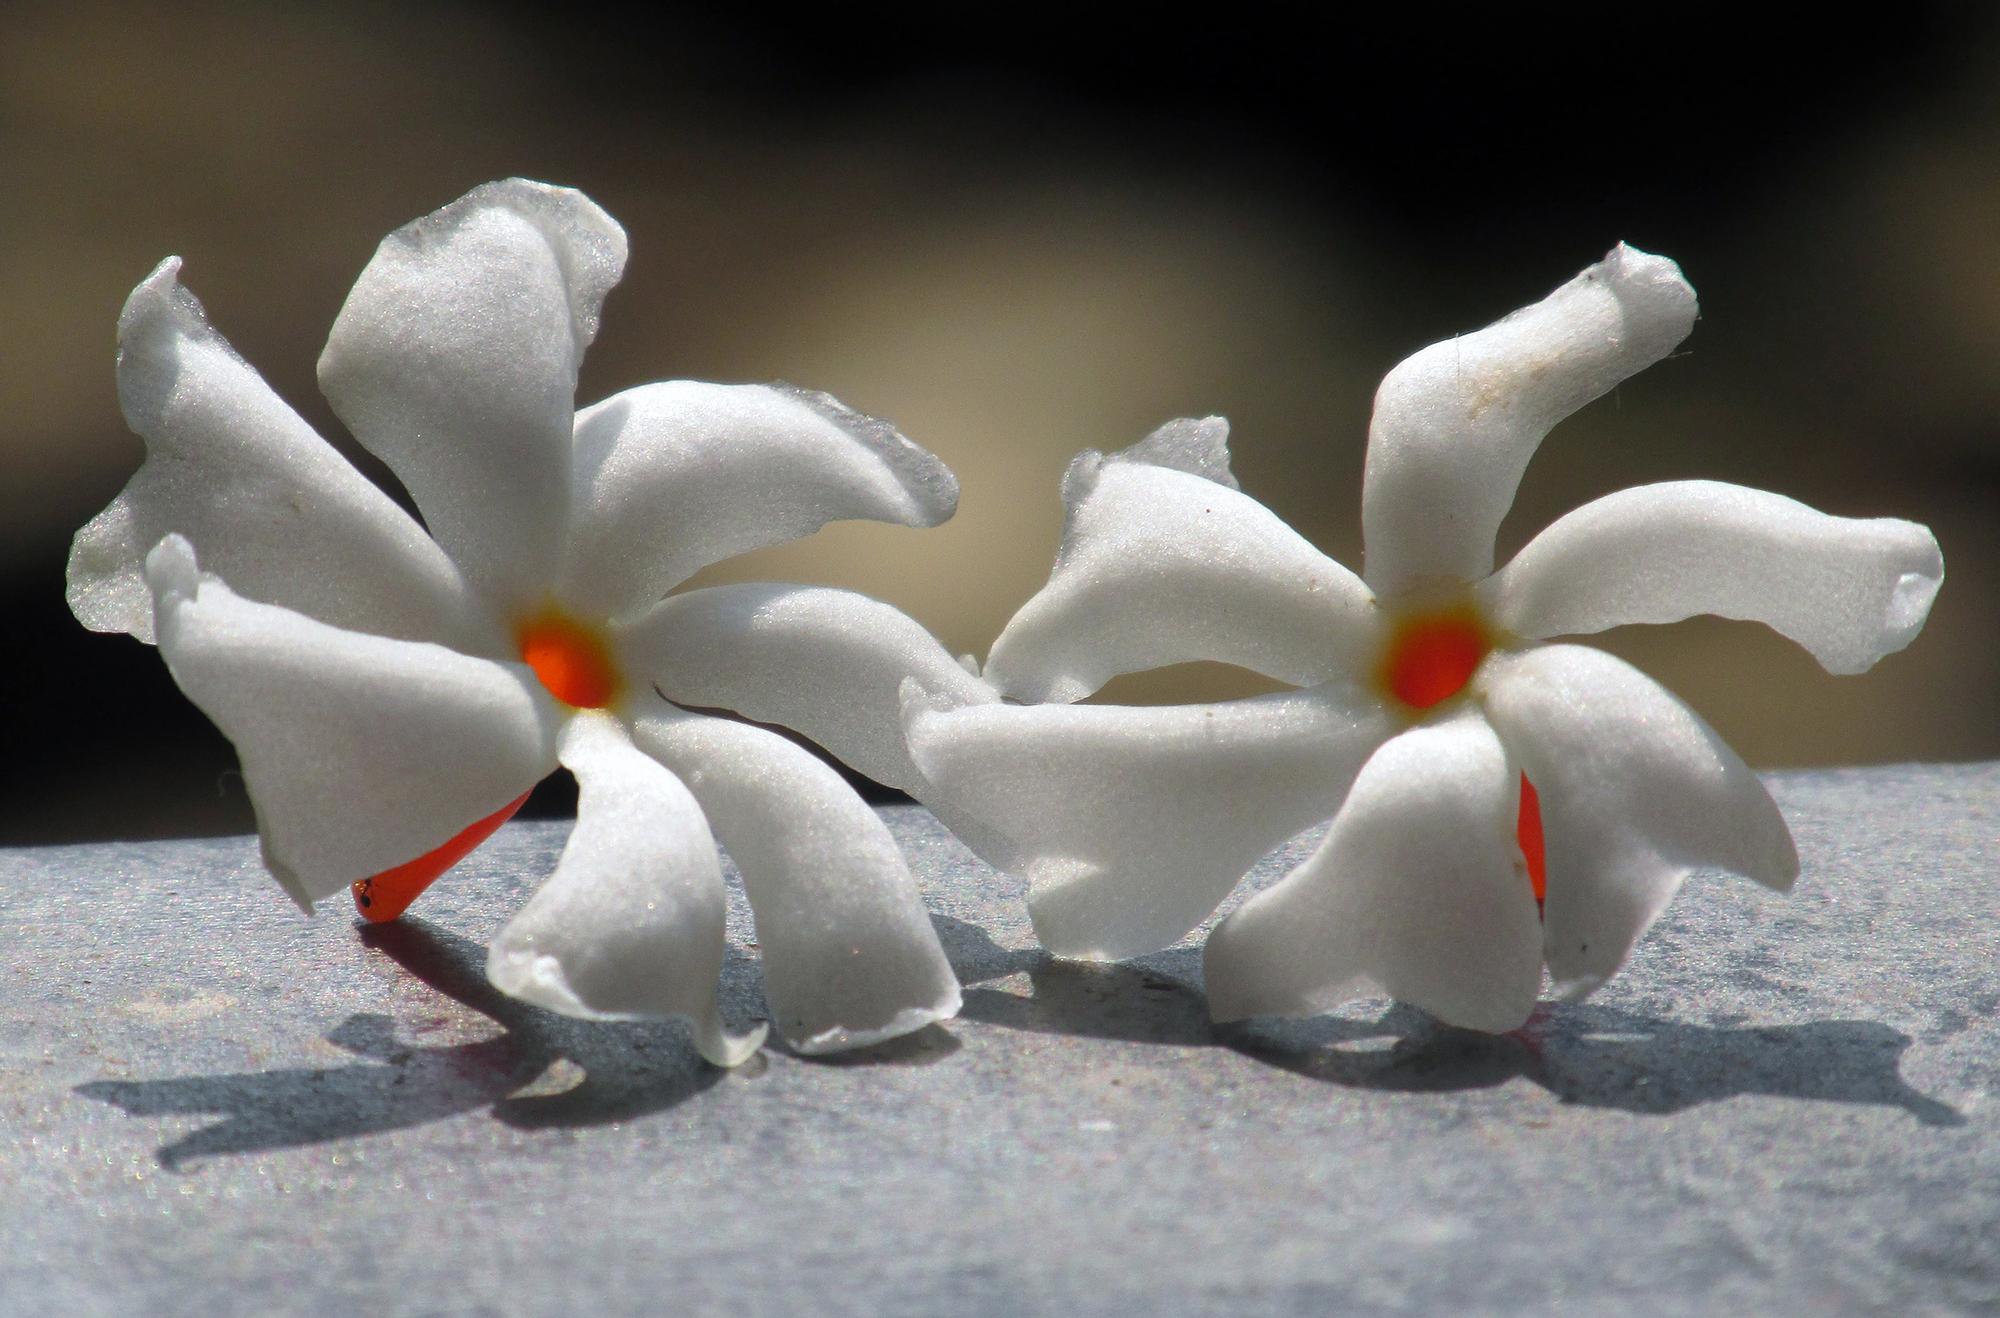 Filenight Jasmine Flower Assam India